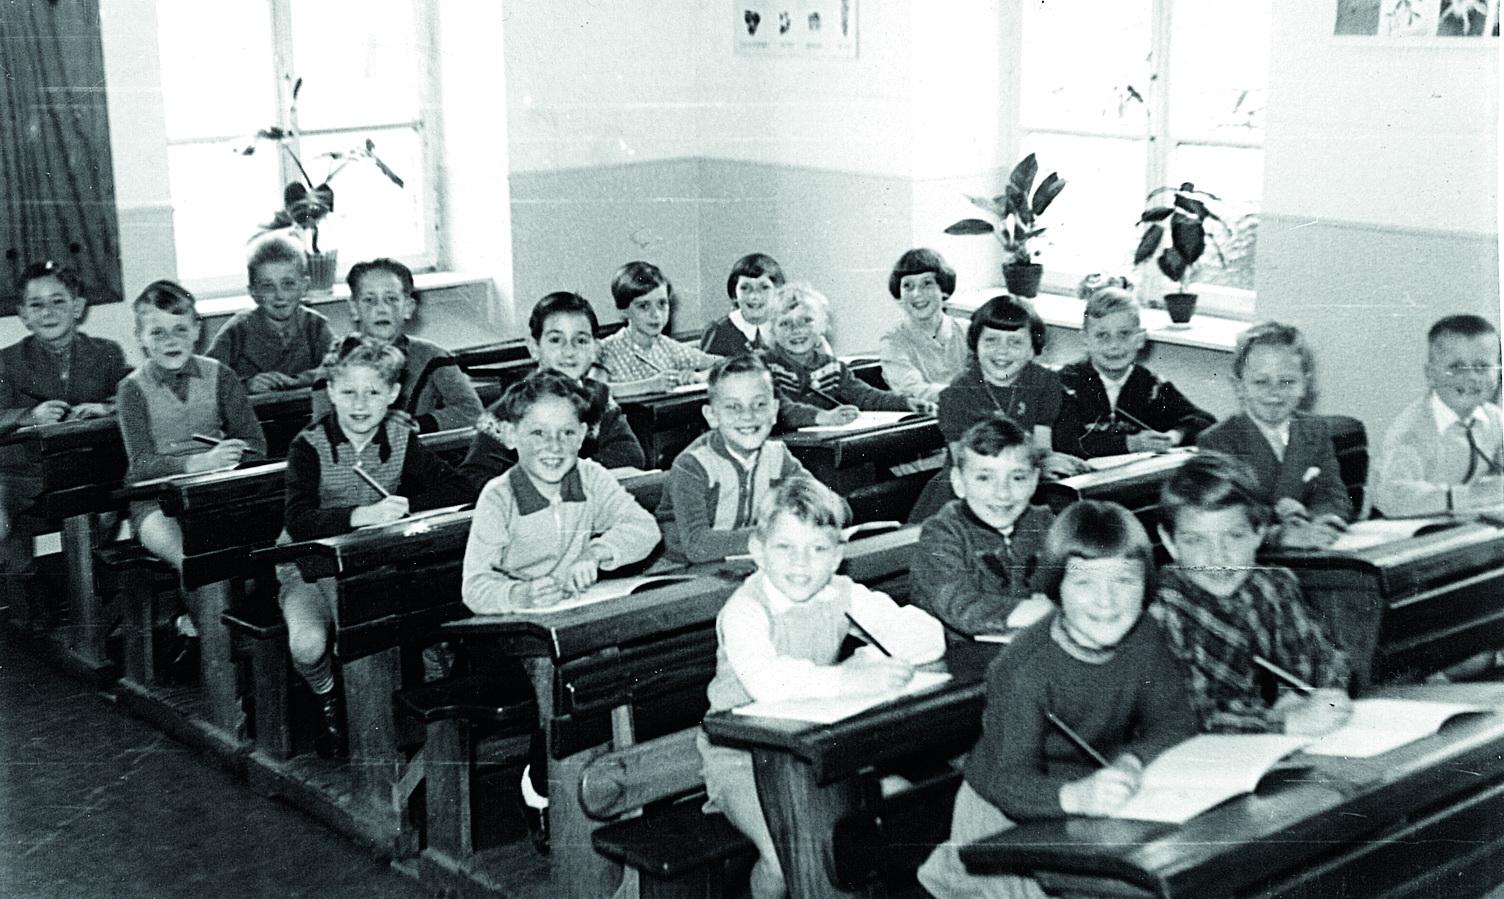 Dorfschulklasse 1955-1956